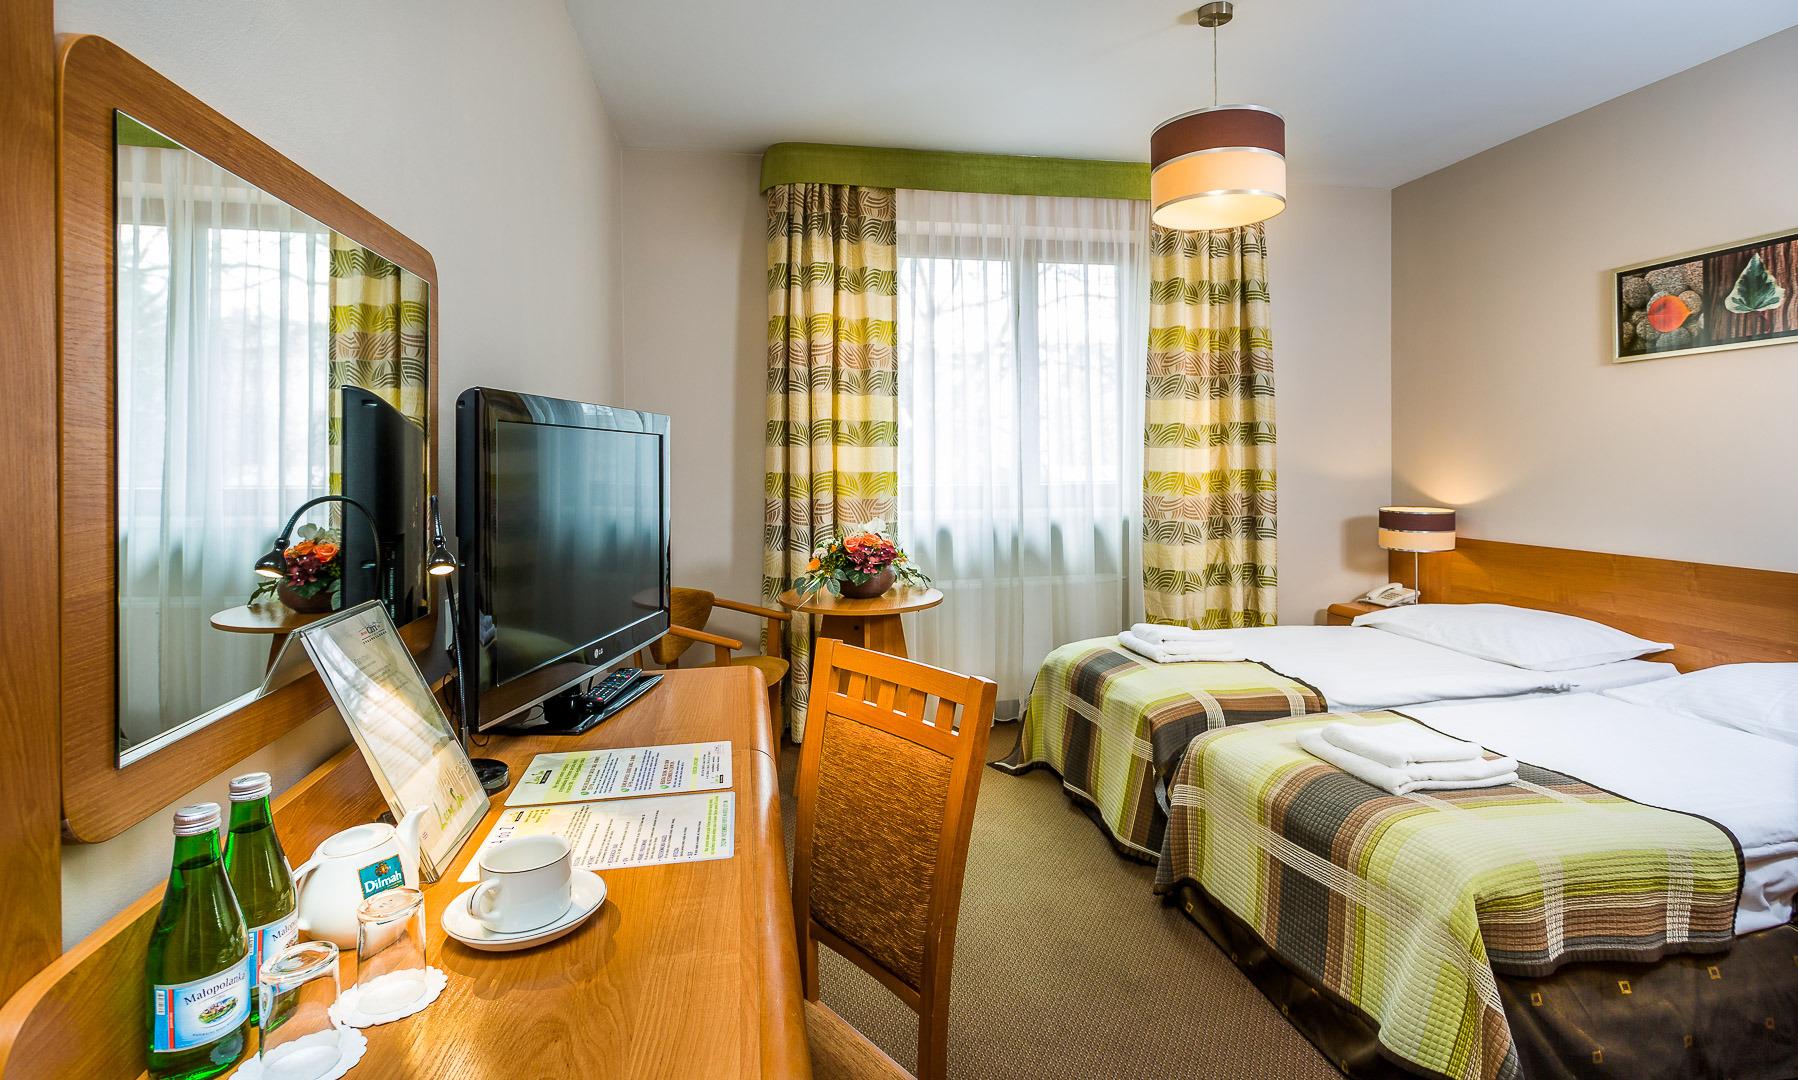 web-res_HotelCity-LesneSPA-0007